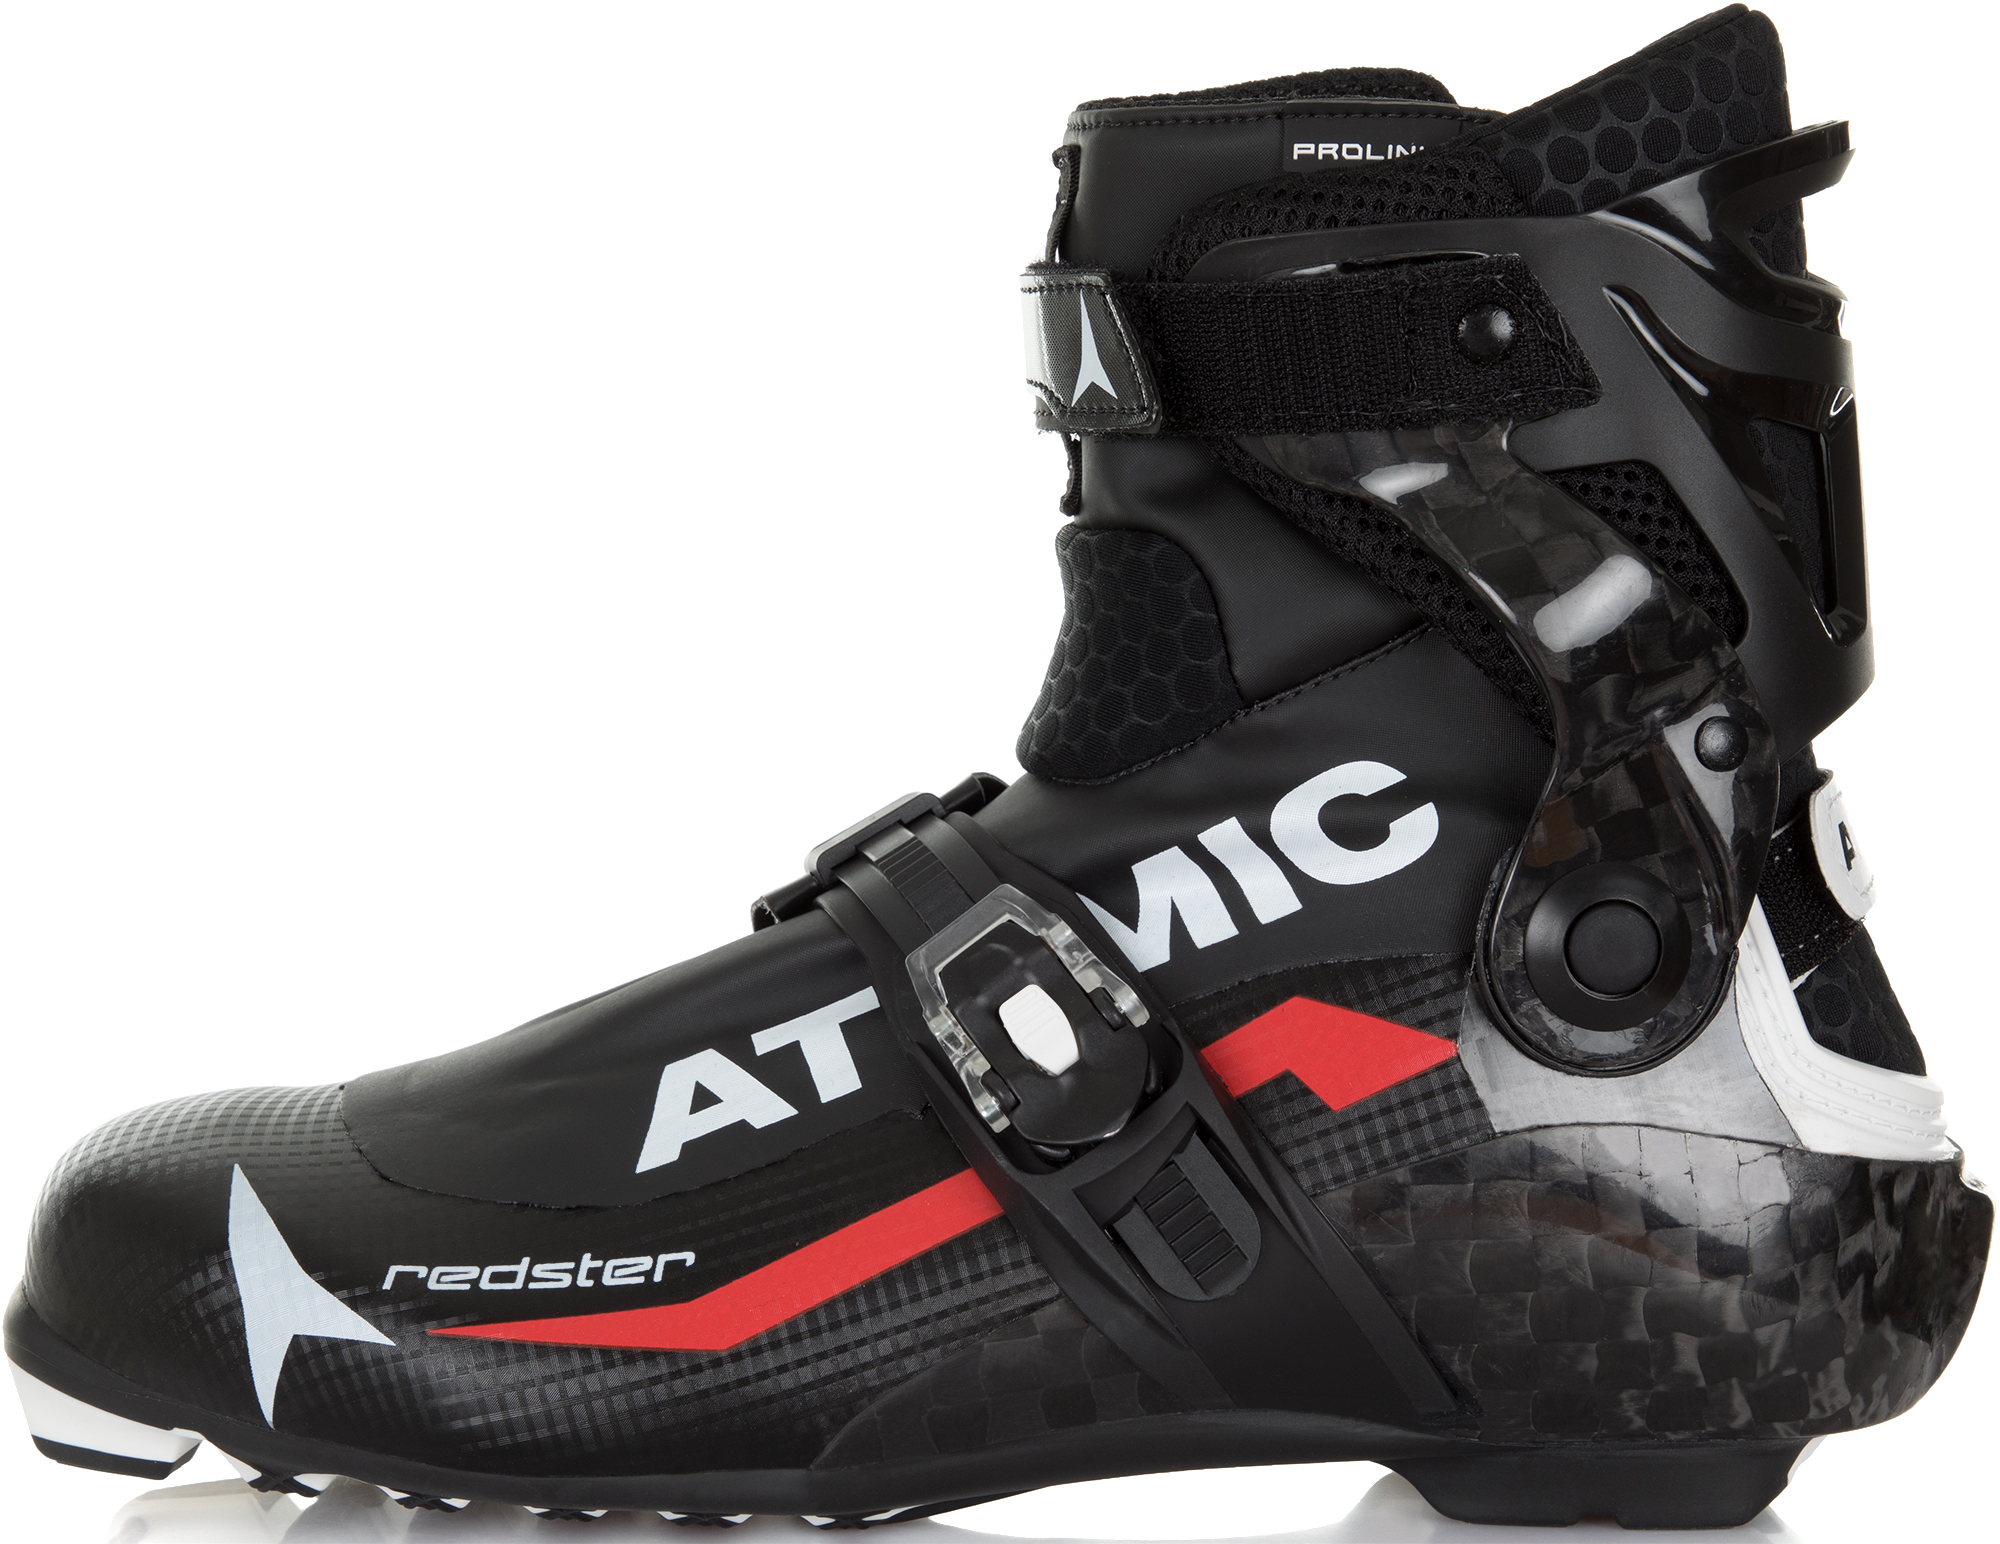 Atomic Ботинки для беговых лыж Redster World Cup Sk Prolink